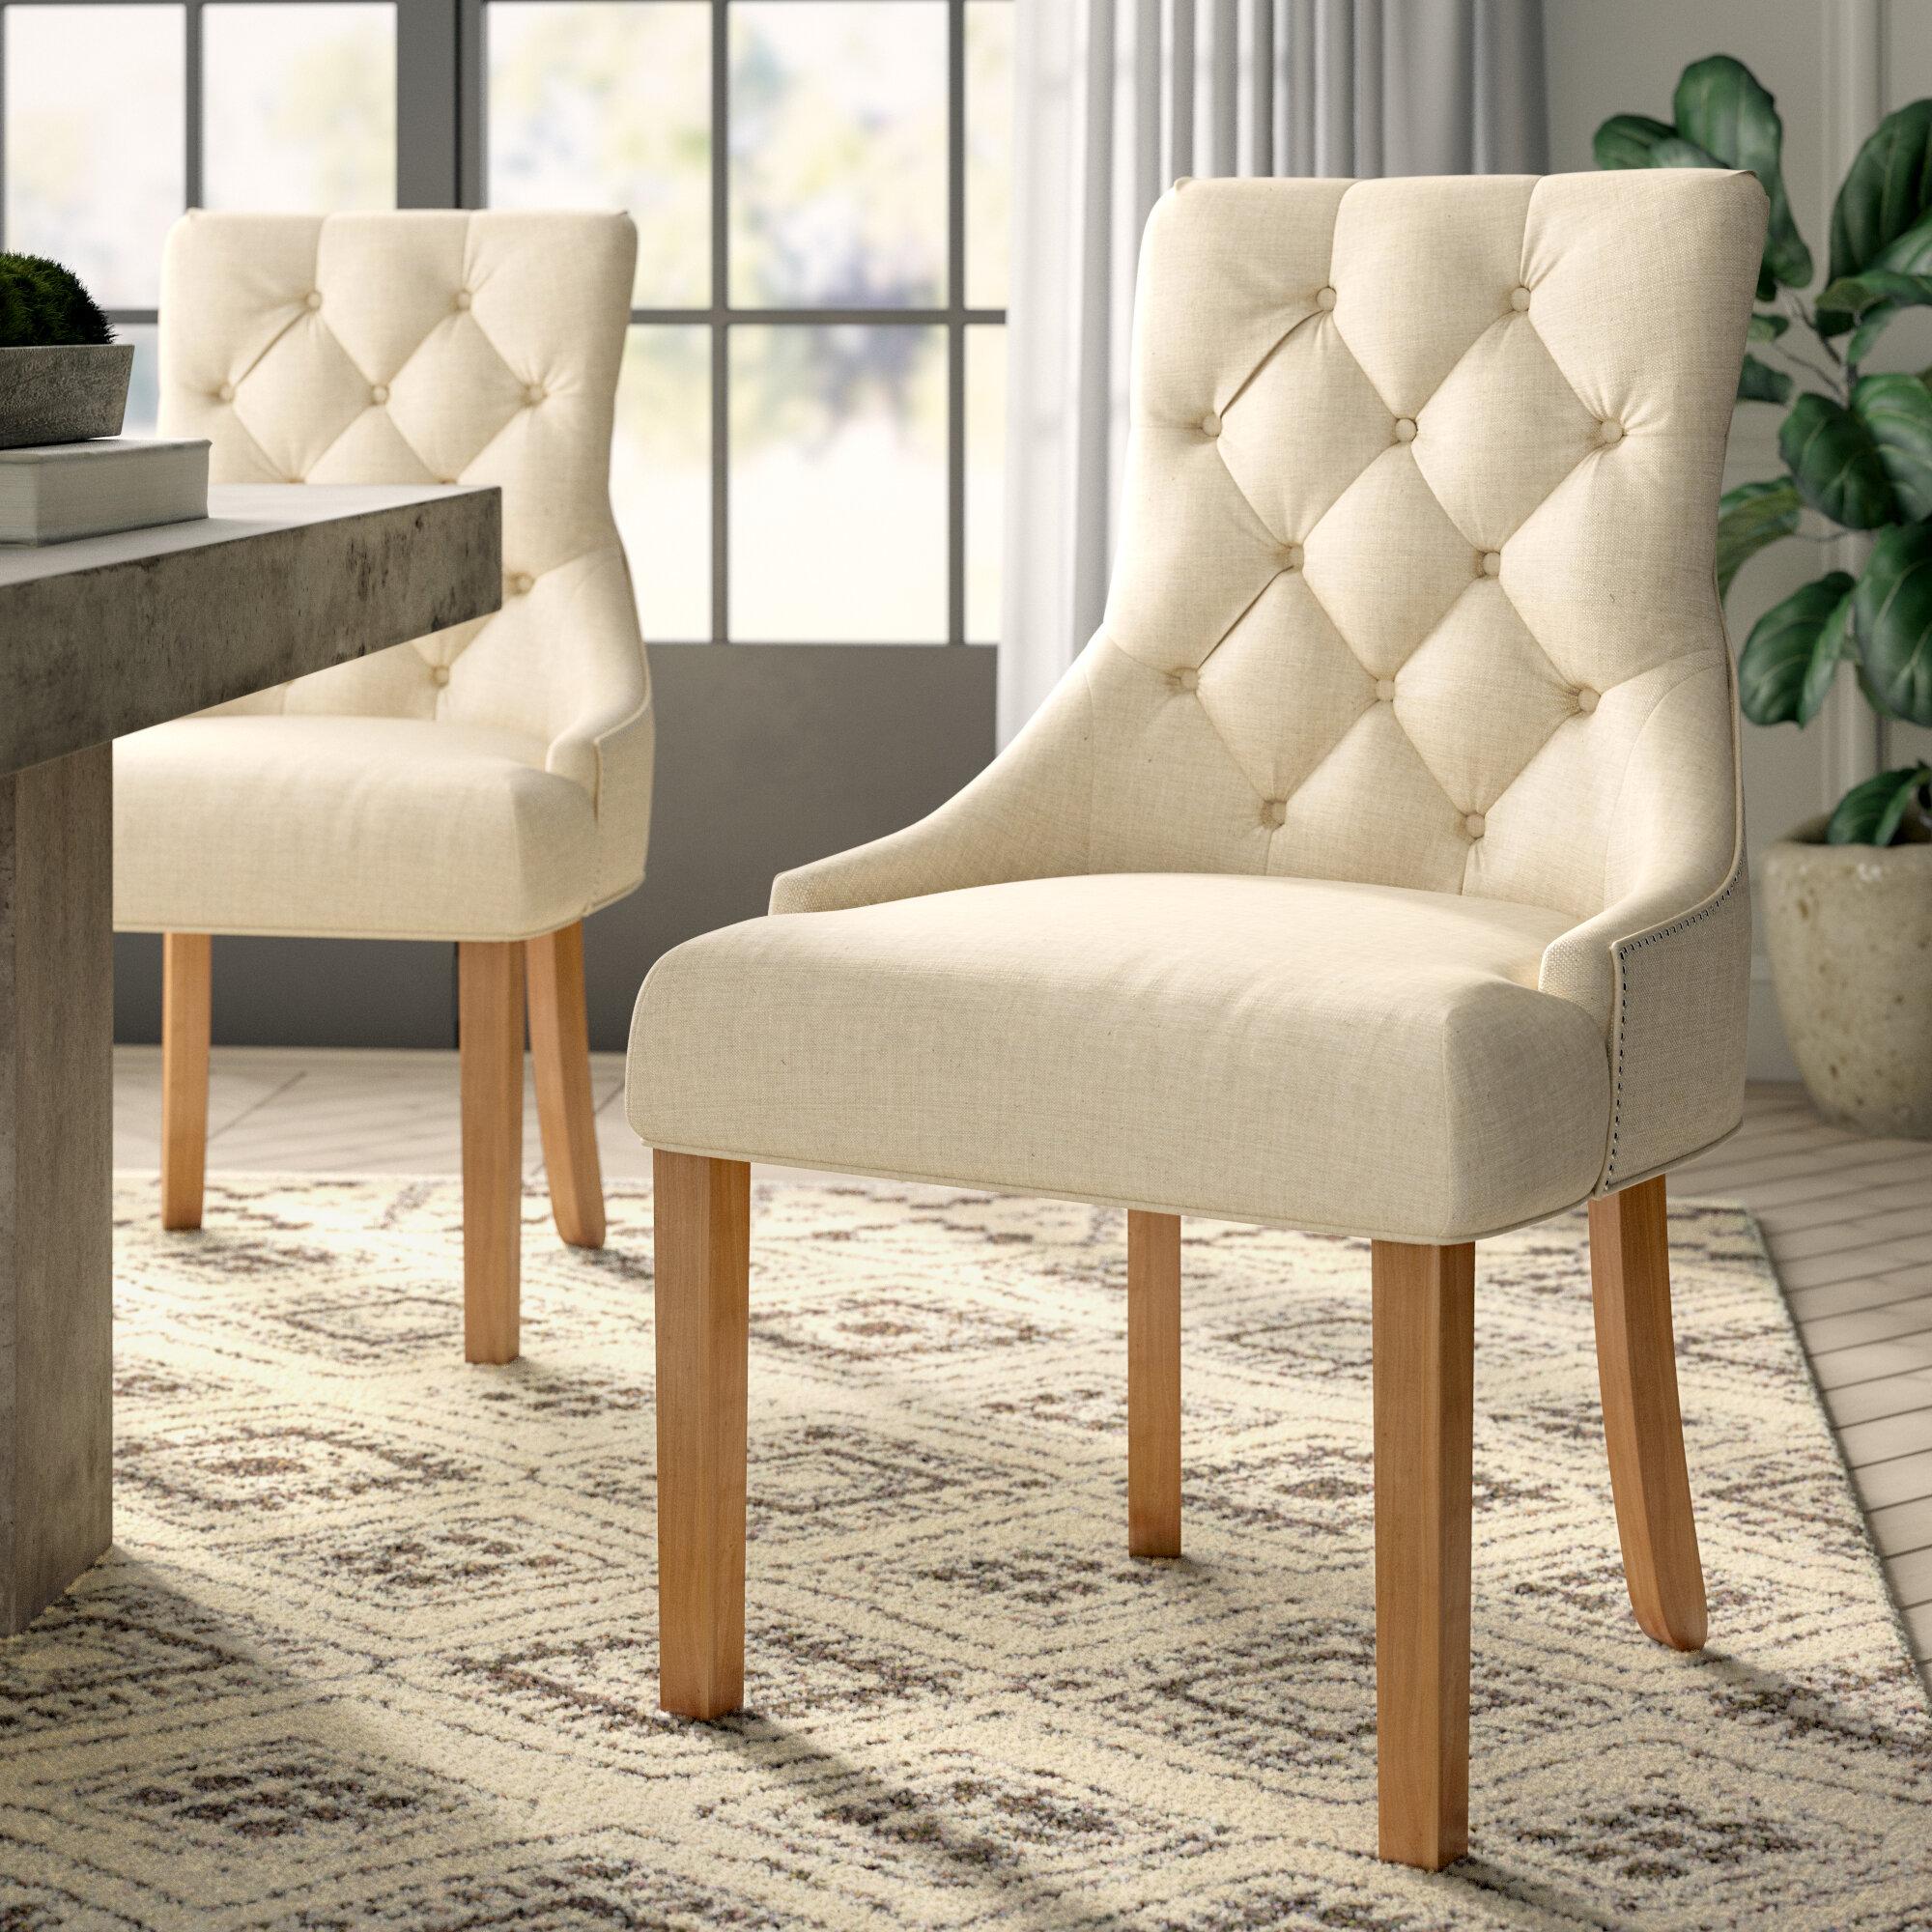 Greyleigh margie upholstered side chair reviews wayfair